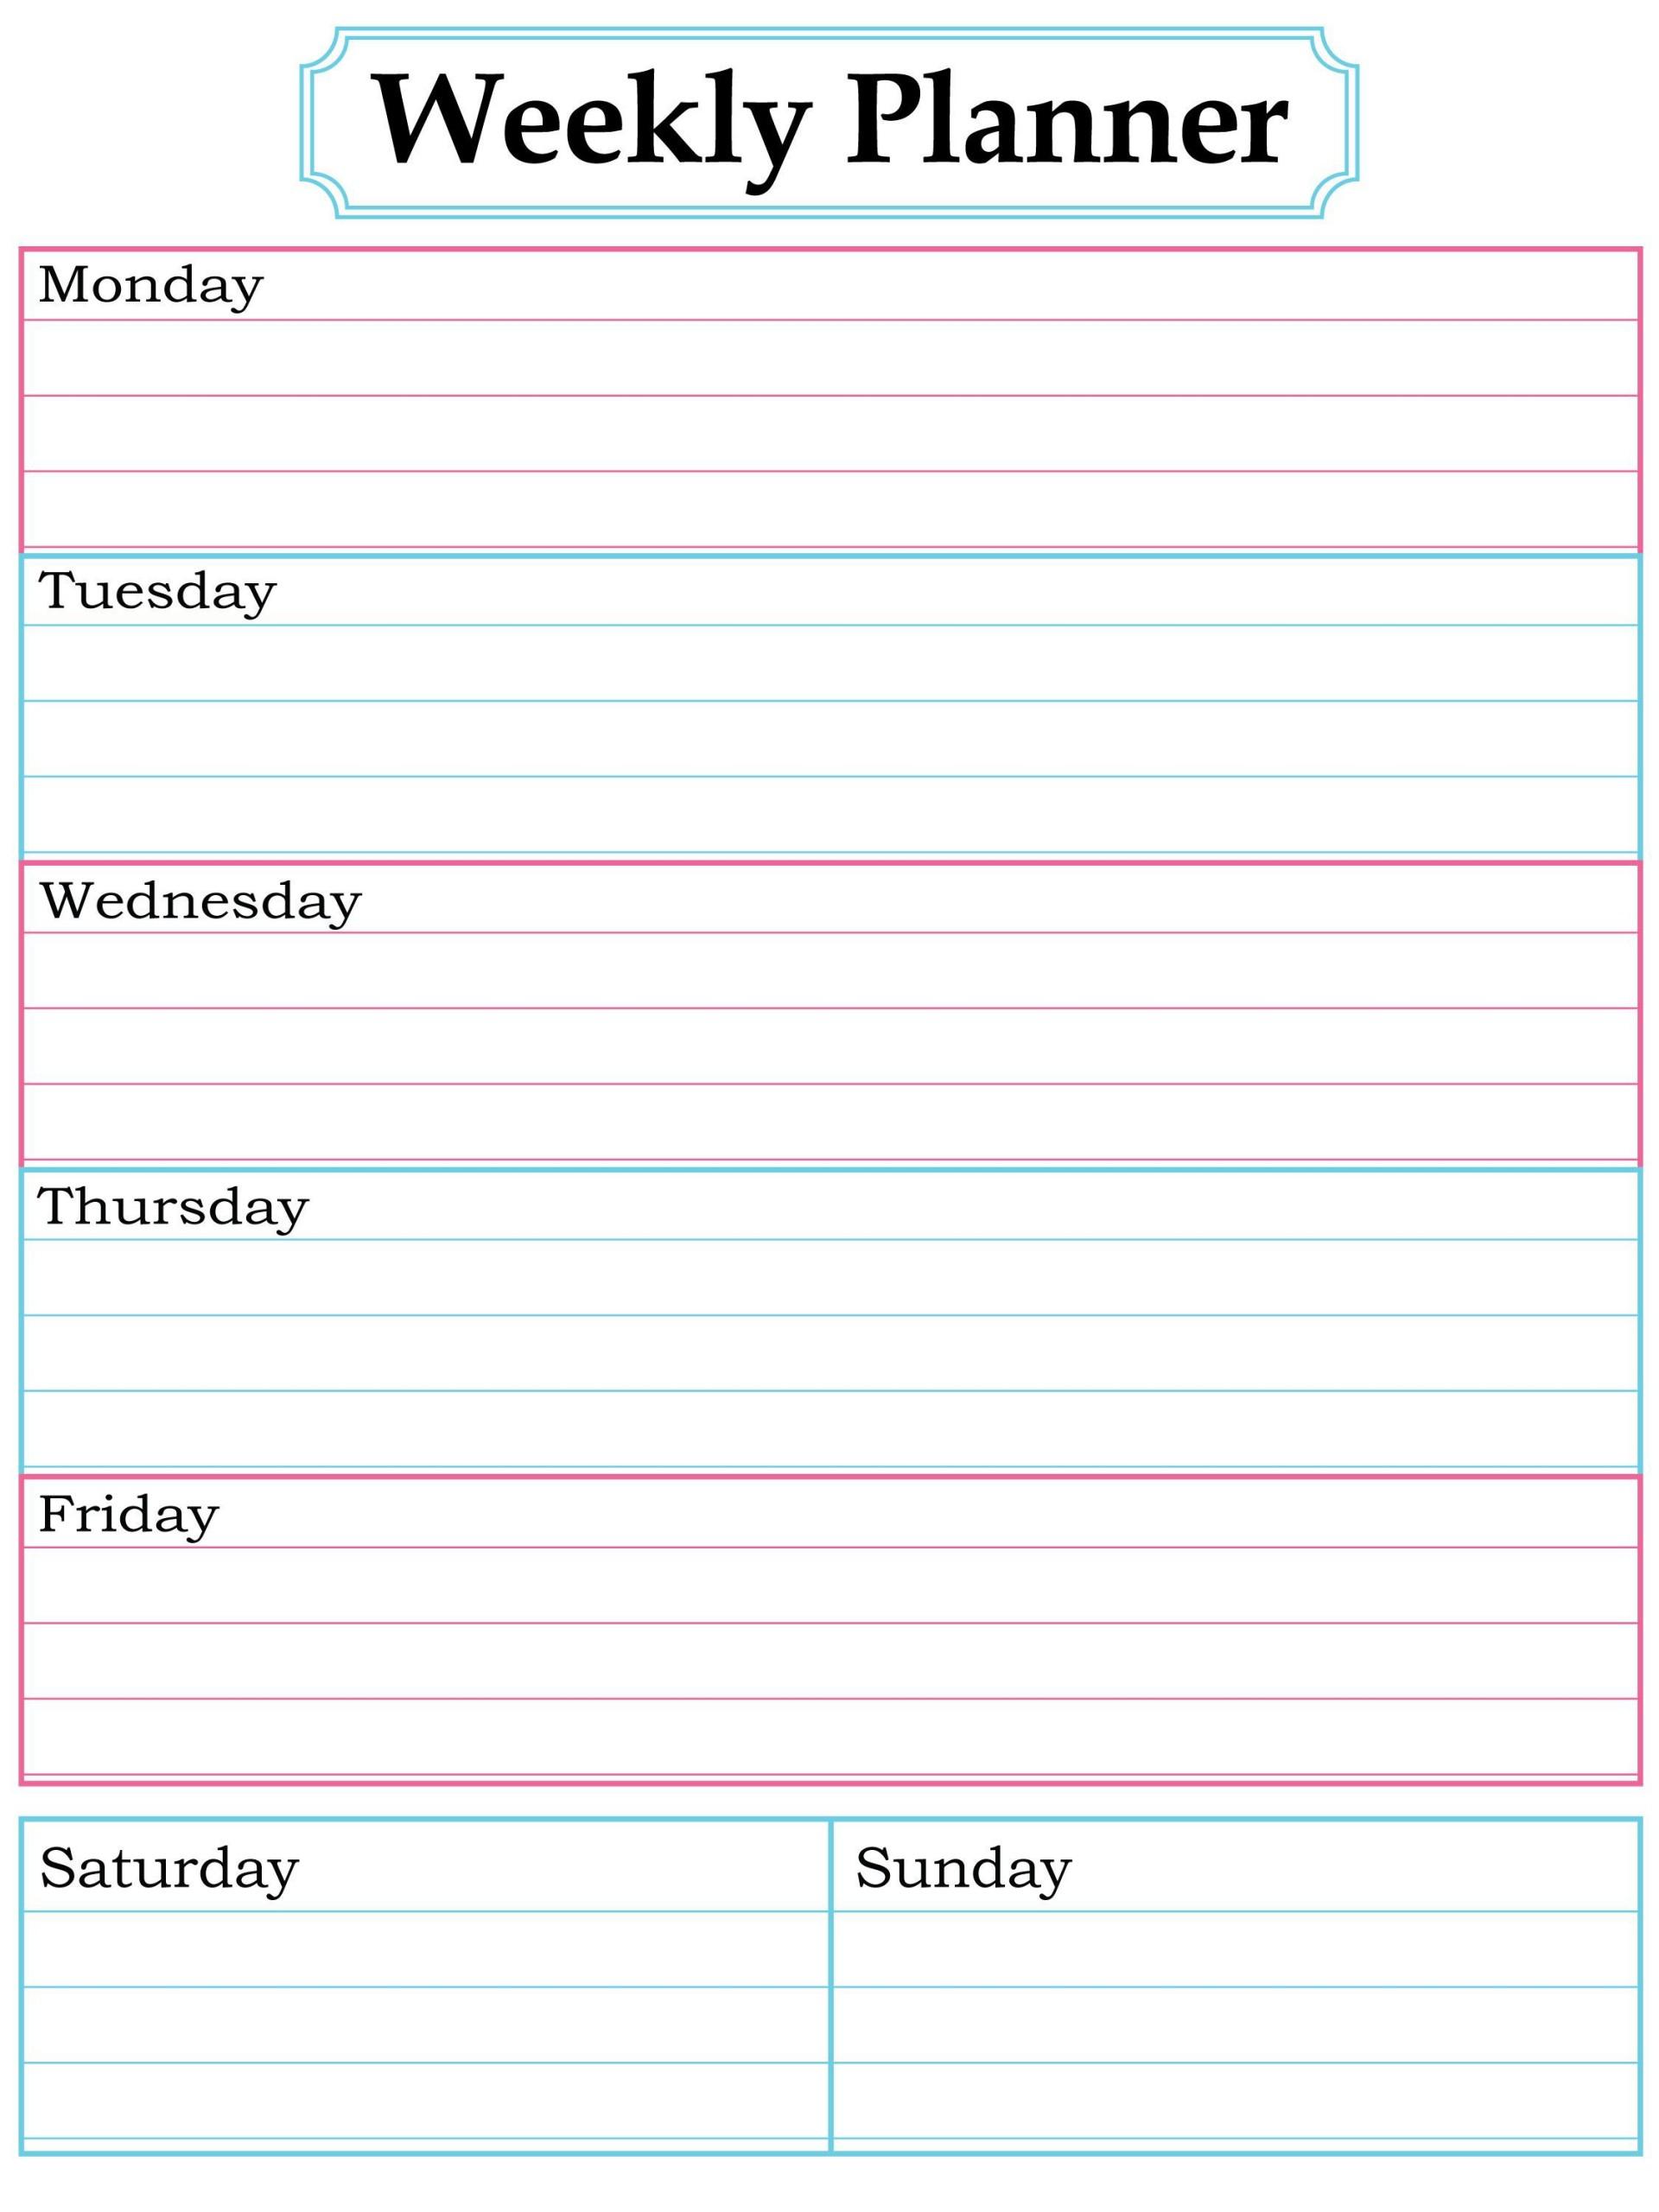 003 Surprising Printable Weekly Planner Template Cute Inspiration  Free Calendar1920